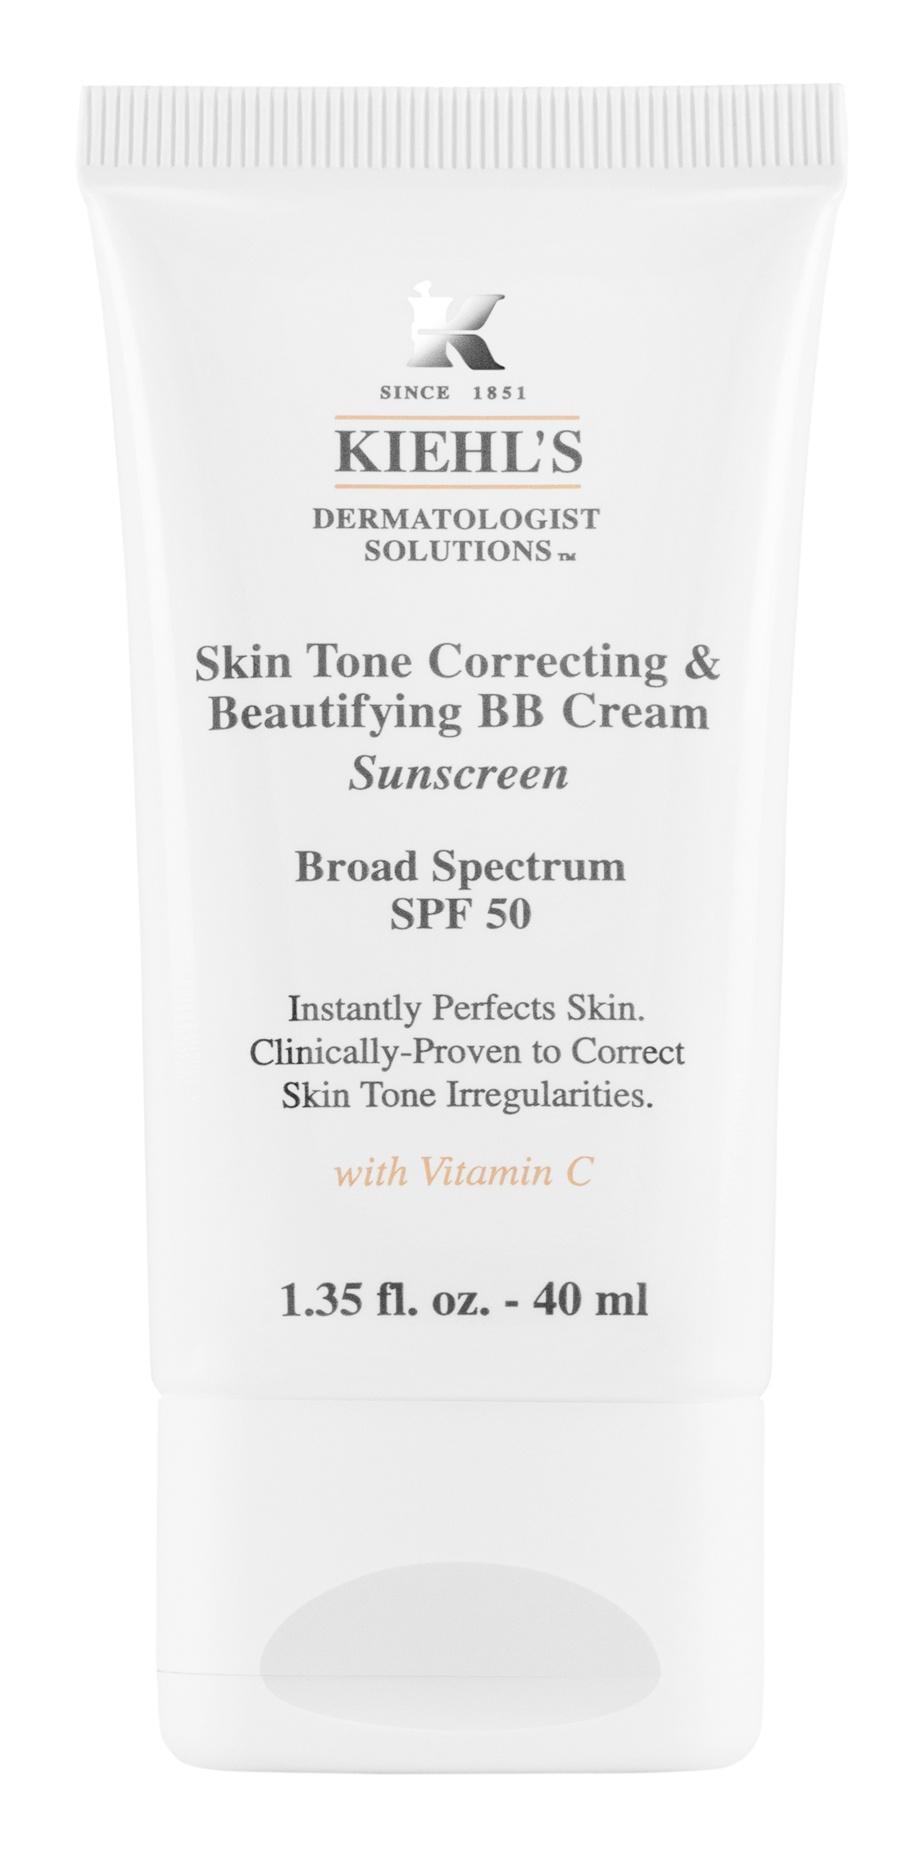 Kiehl's Skin Tone Correcting & Beautifying BB Cream SPF 50